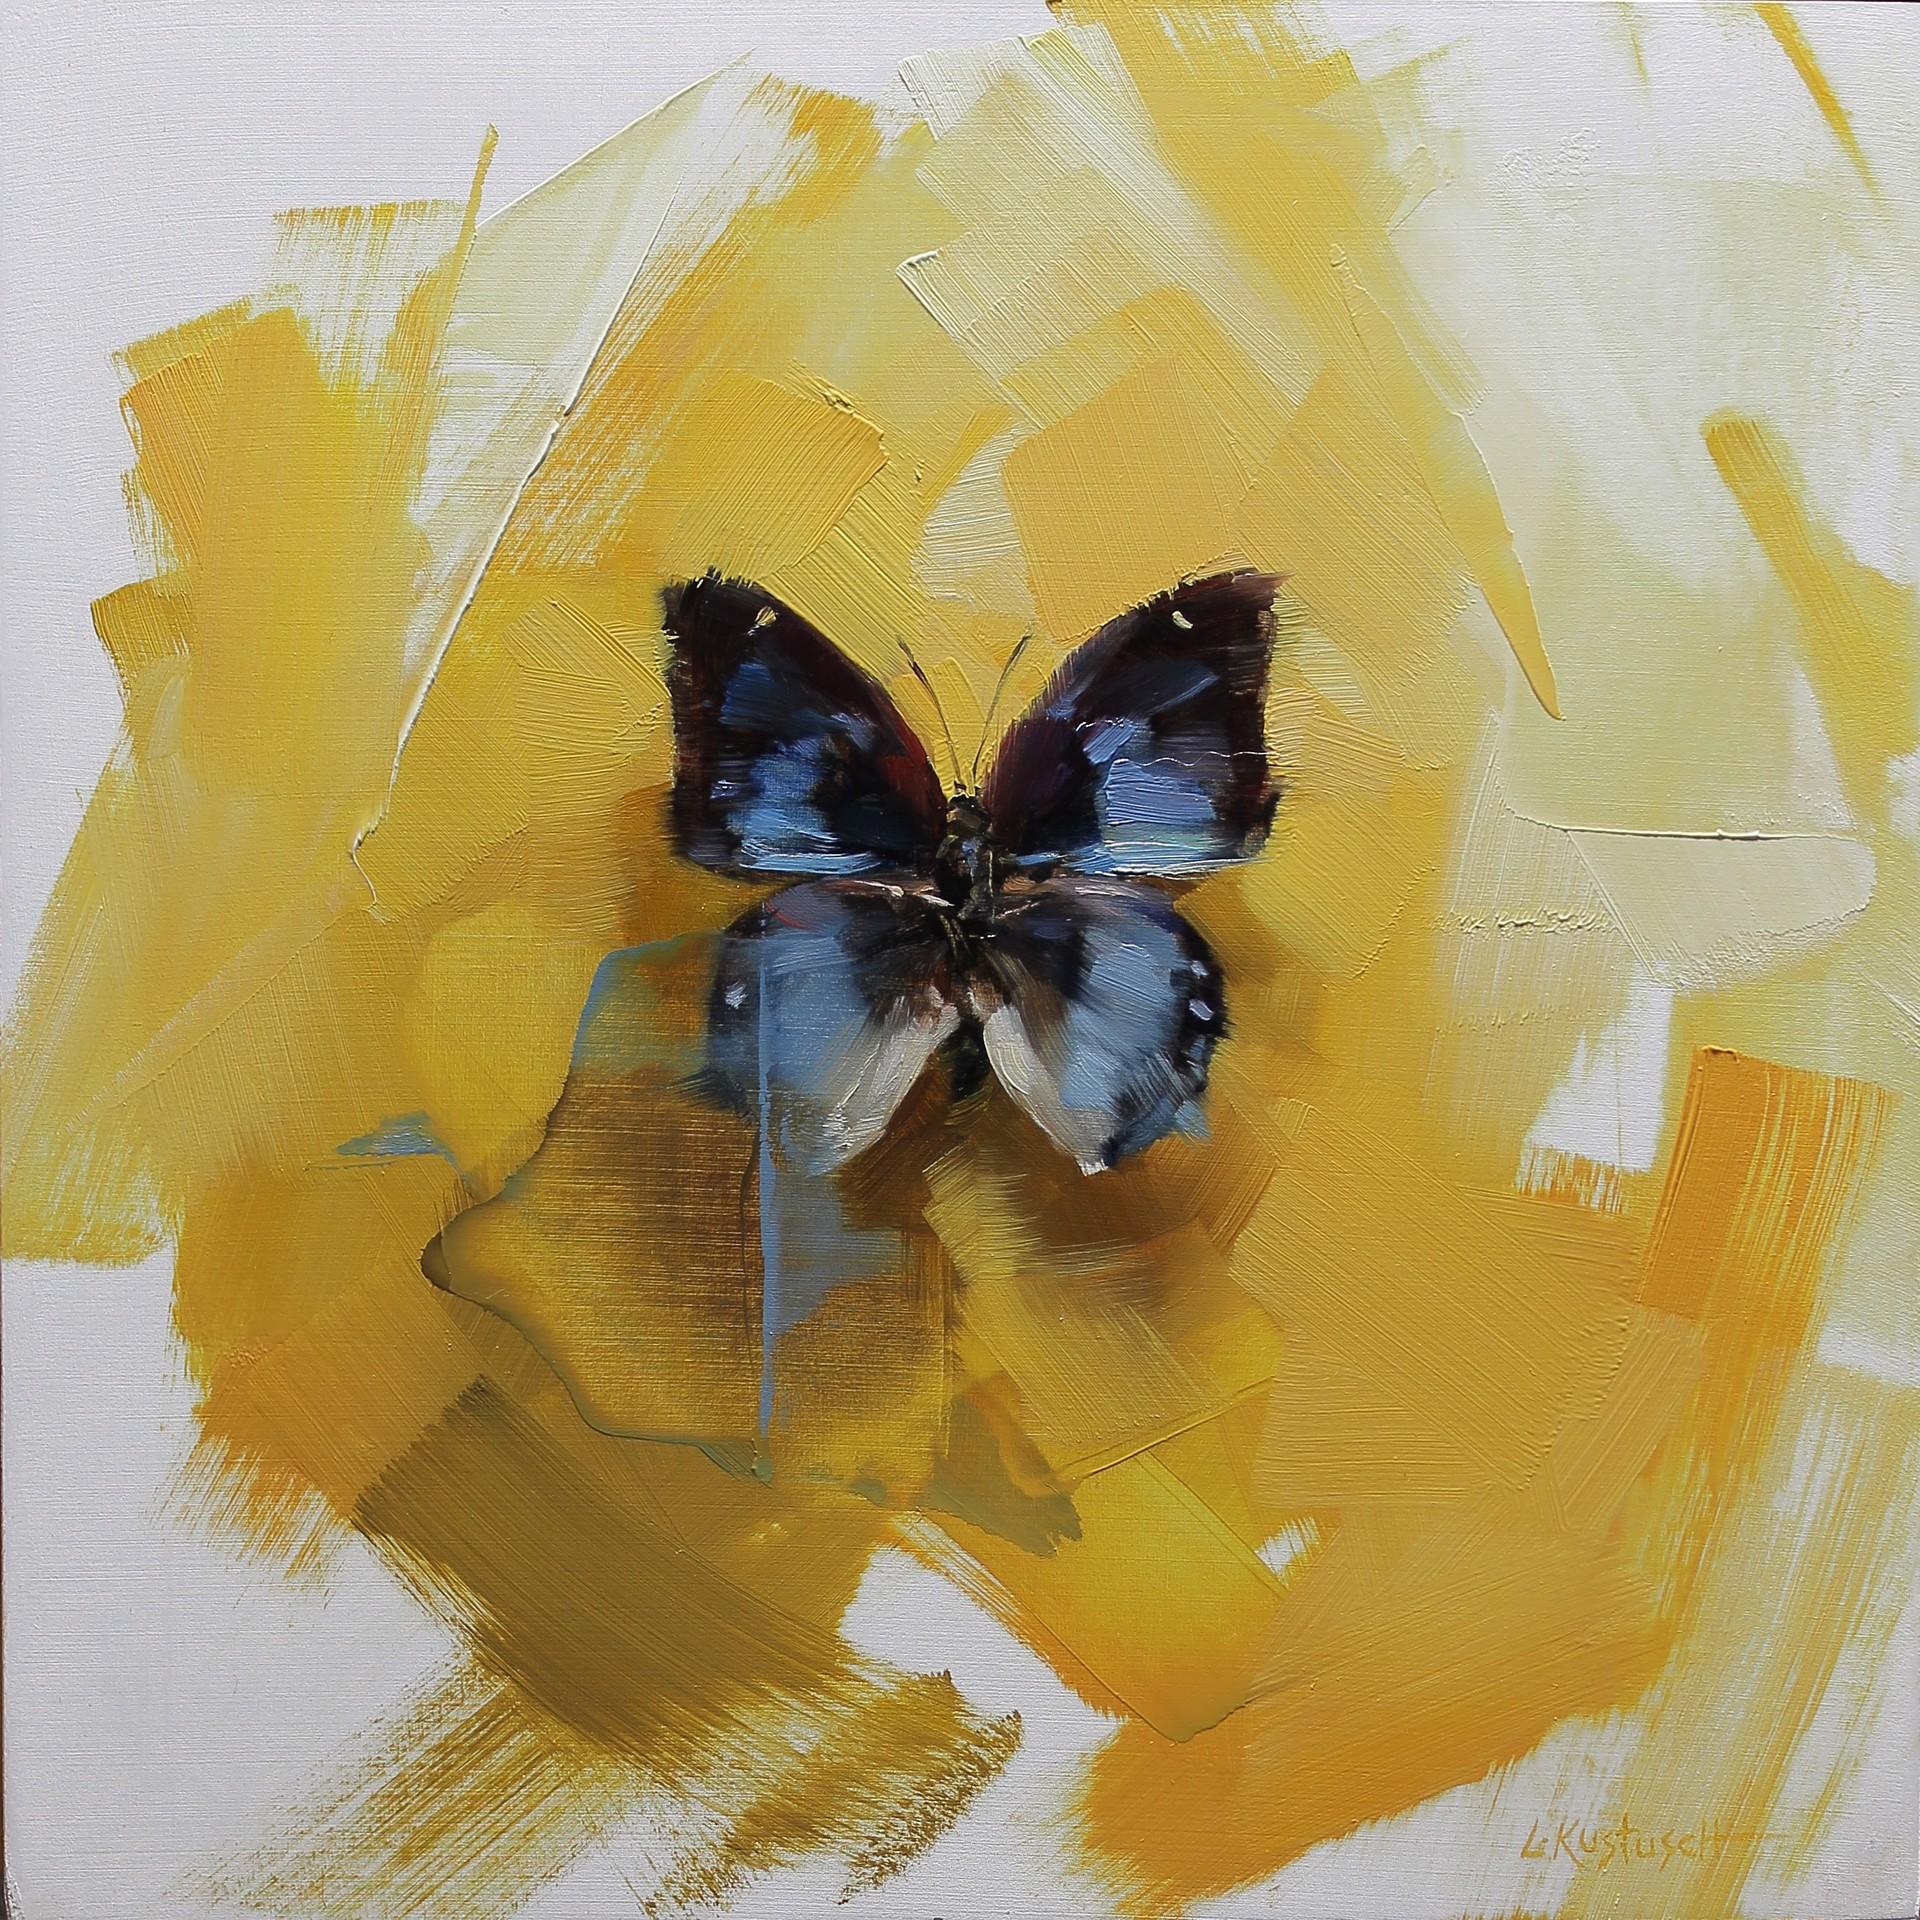 The Baeotus Japetus on Yellow by Lindsey Kustusch